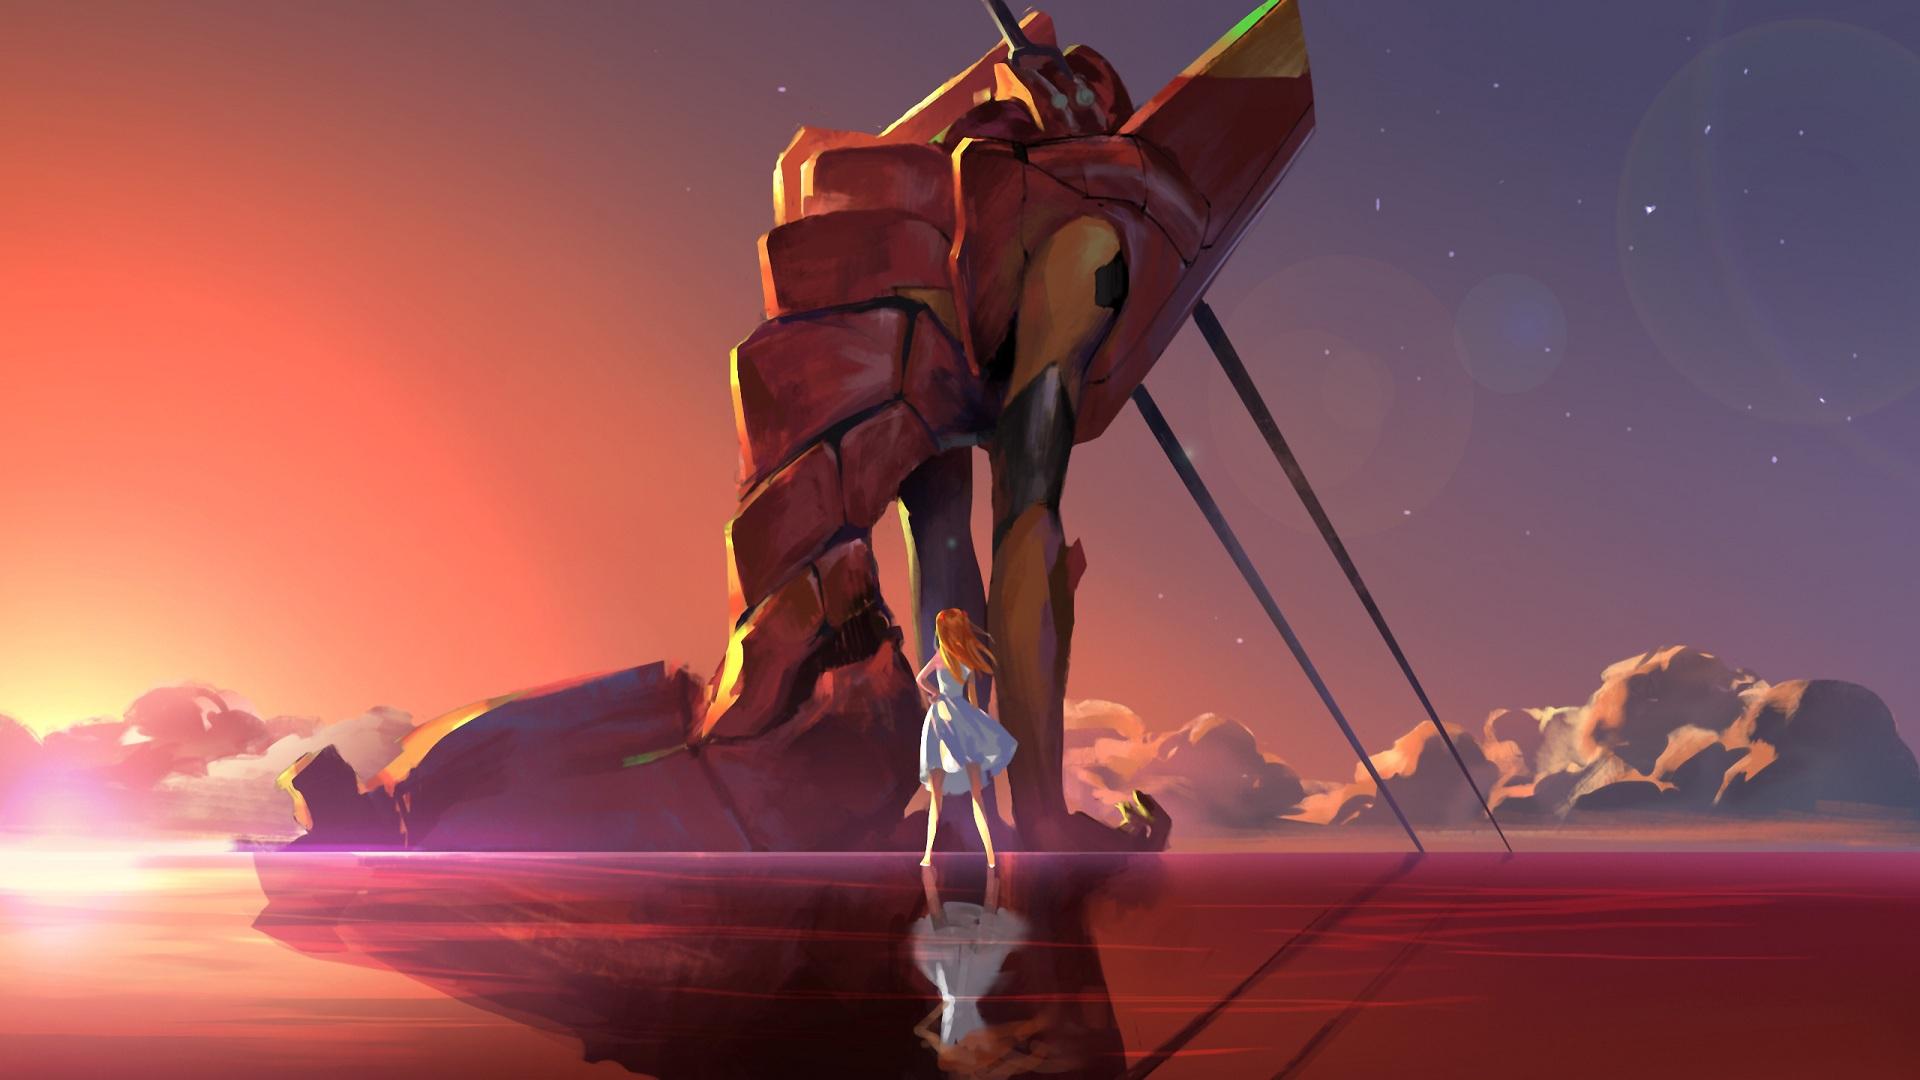 Neon Genesis Evangelion Asuka Langley Soryu EVA 02 Spear Of Longinus